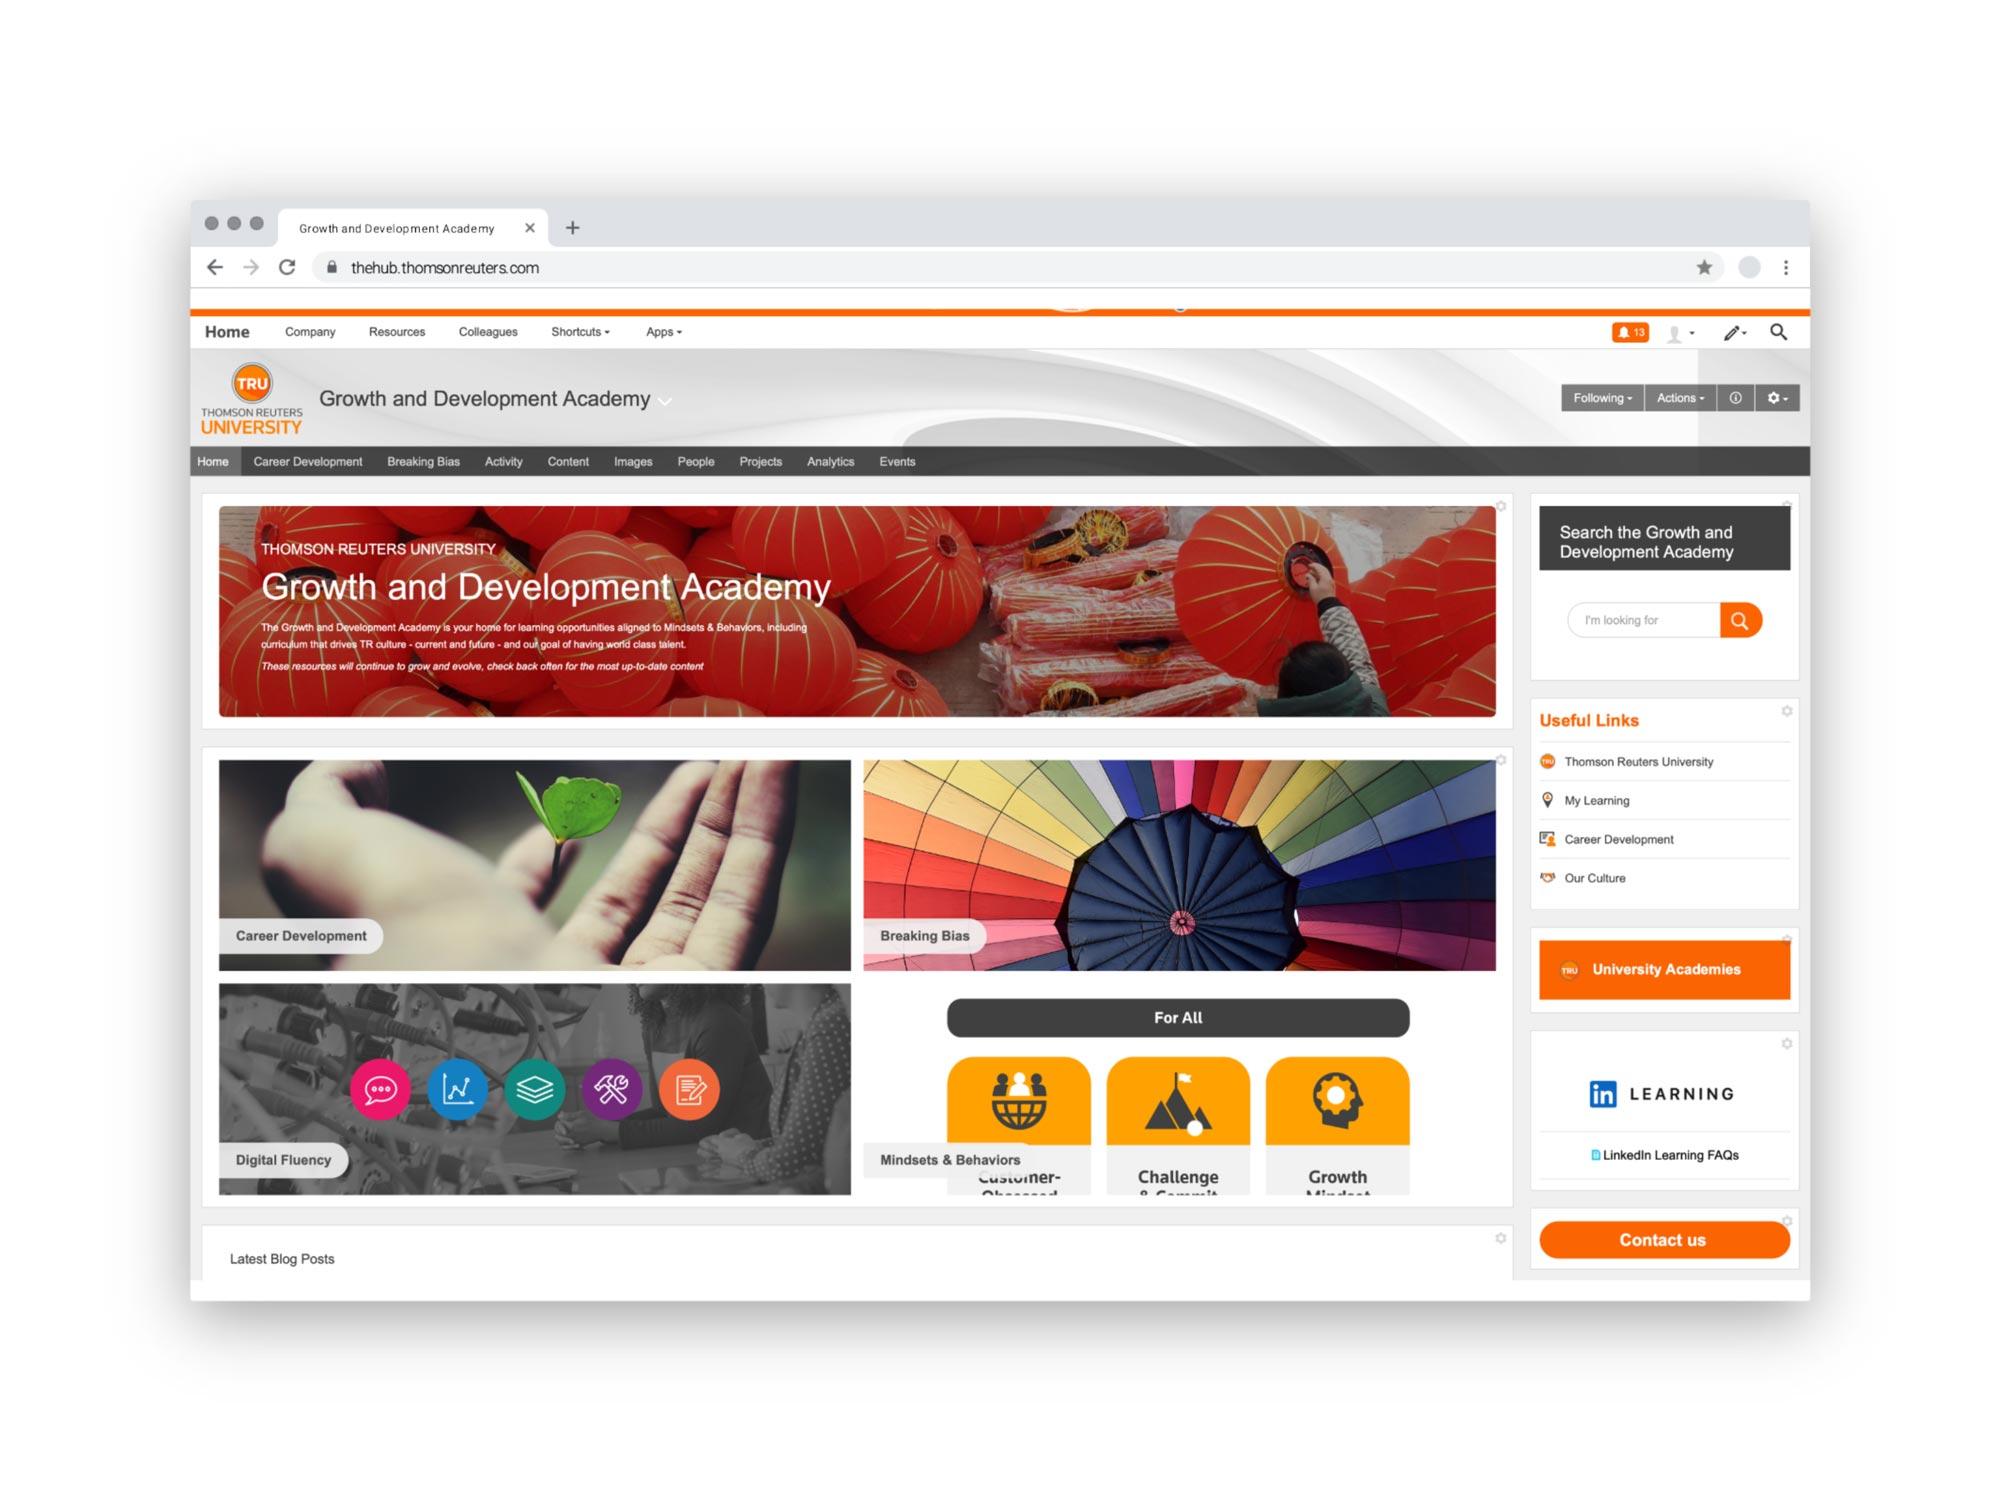 Mindsets and Behaviors Hub Page